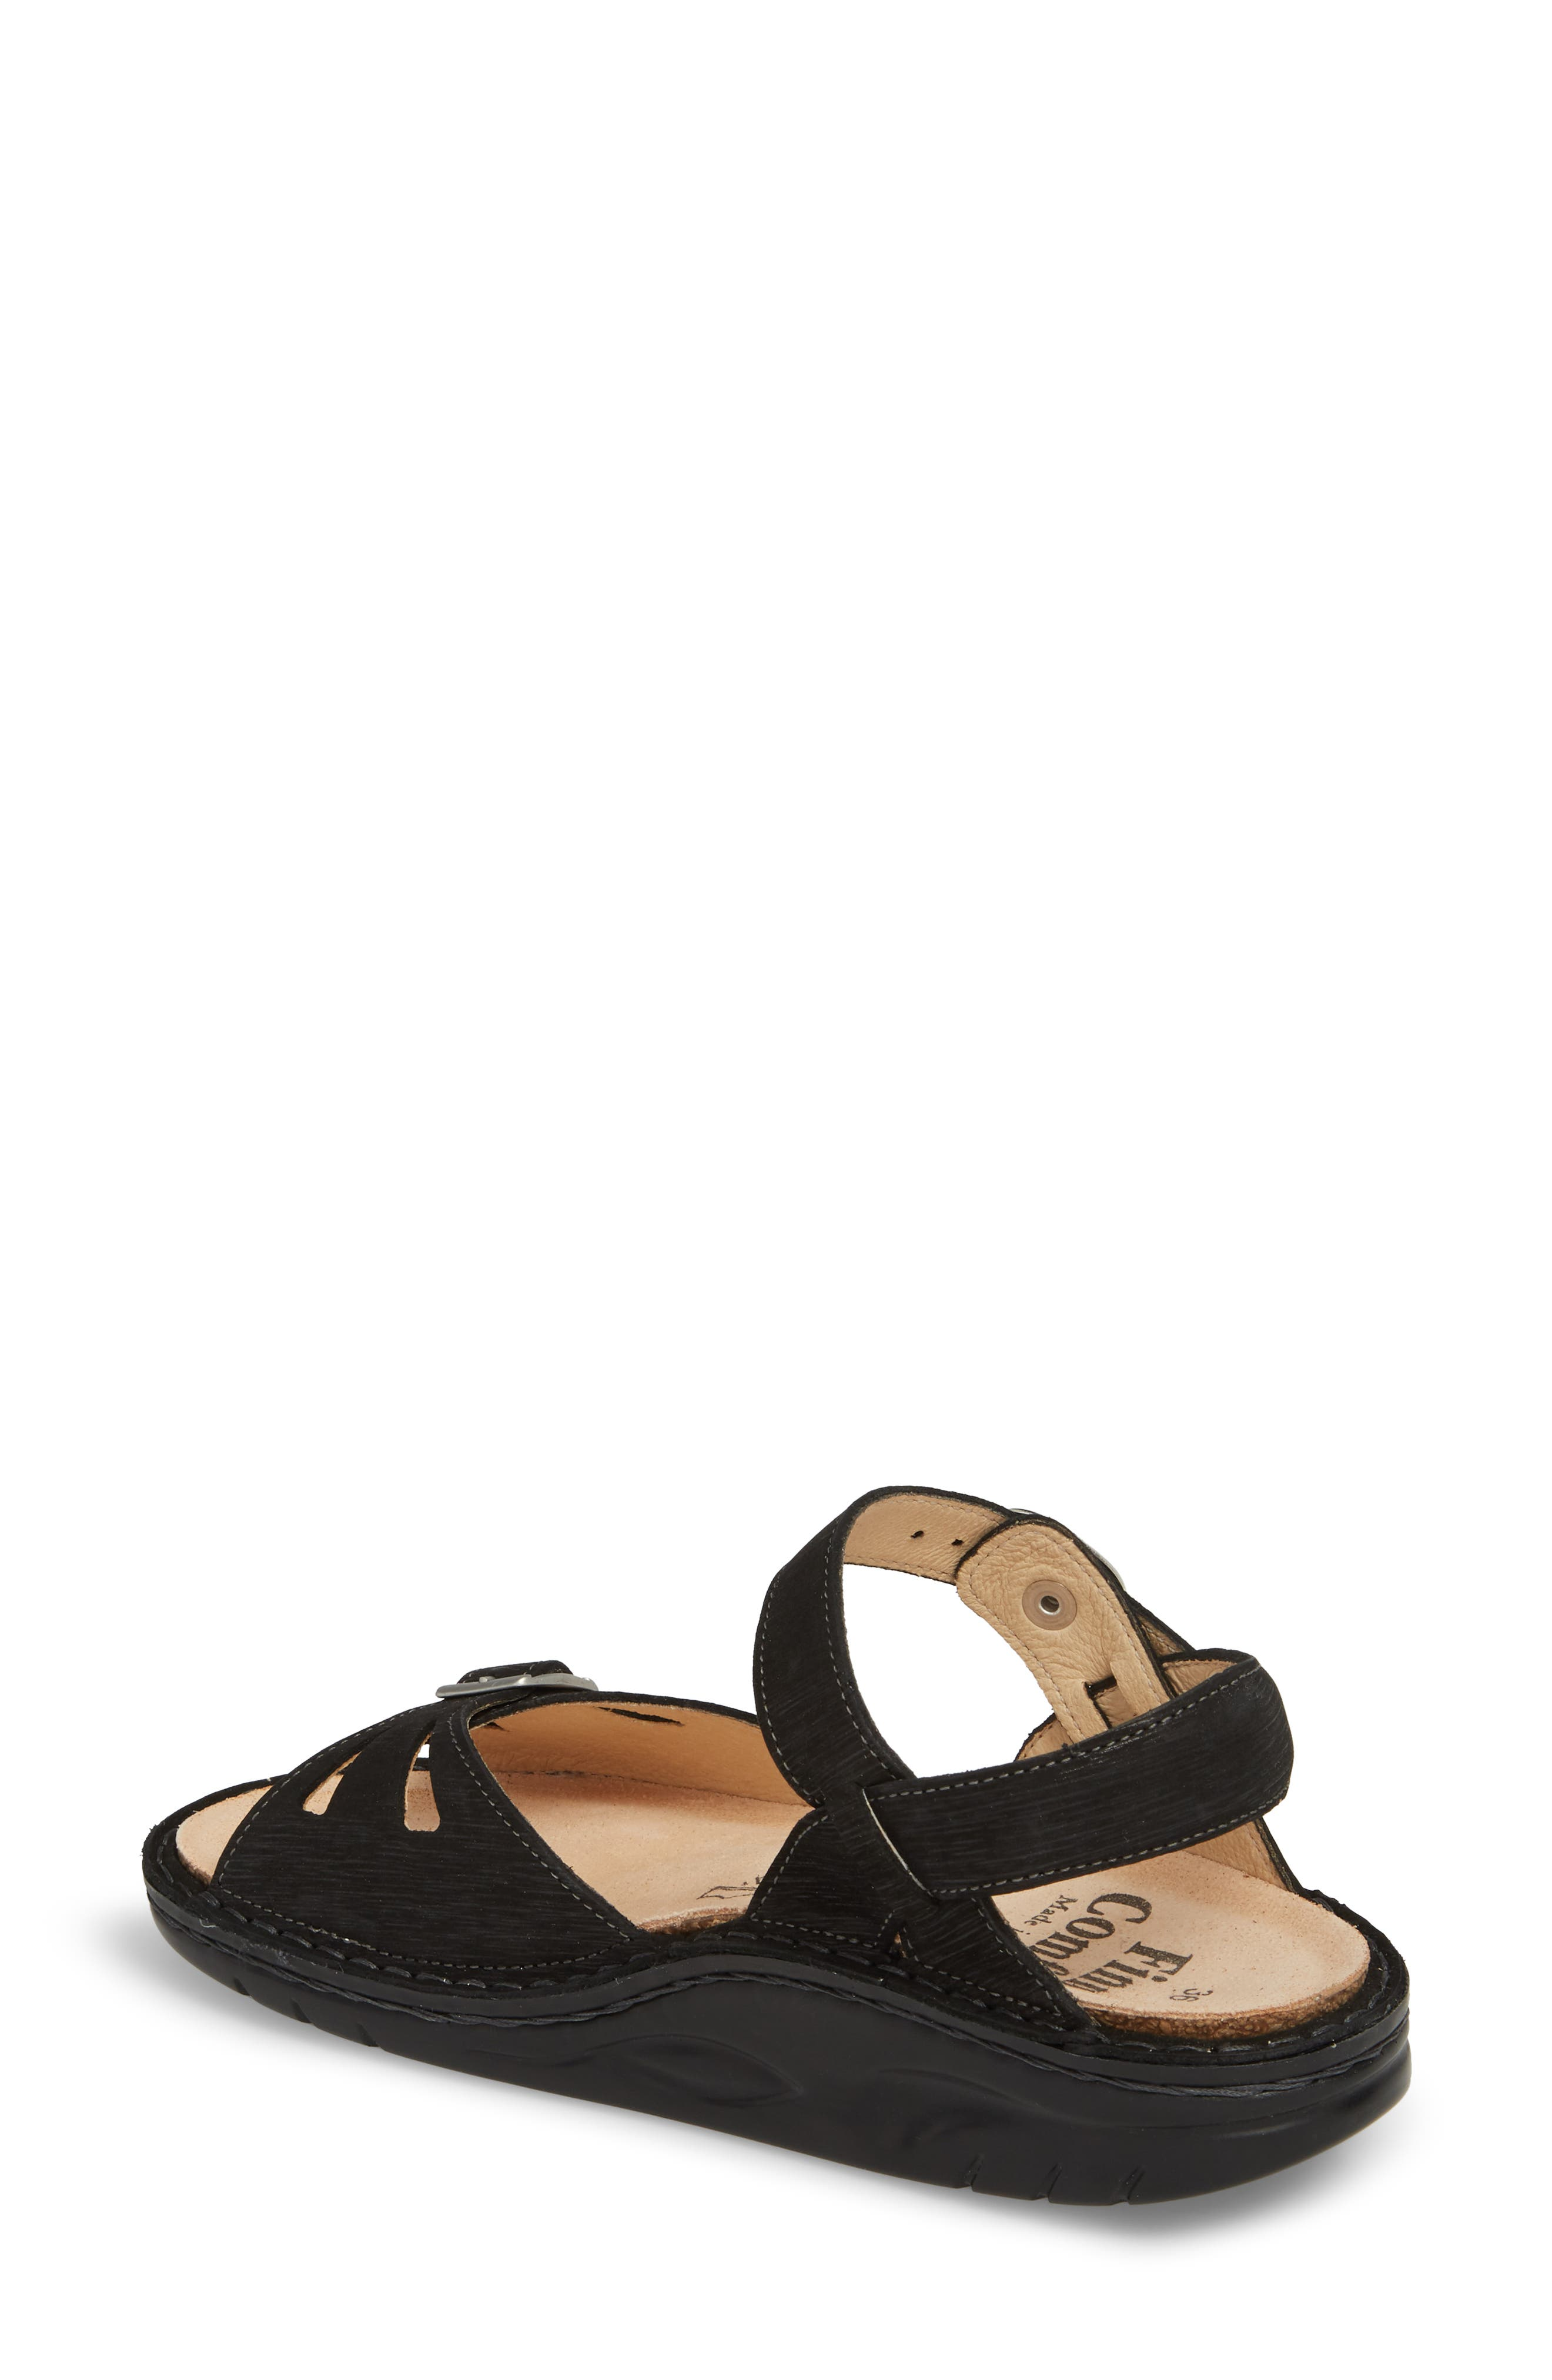 Sandals Finn Comfort Shoes Nordstrom Austin Flats Laken Beige 38